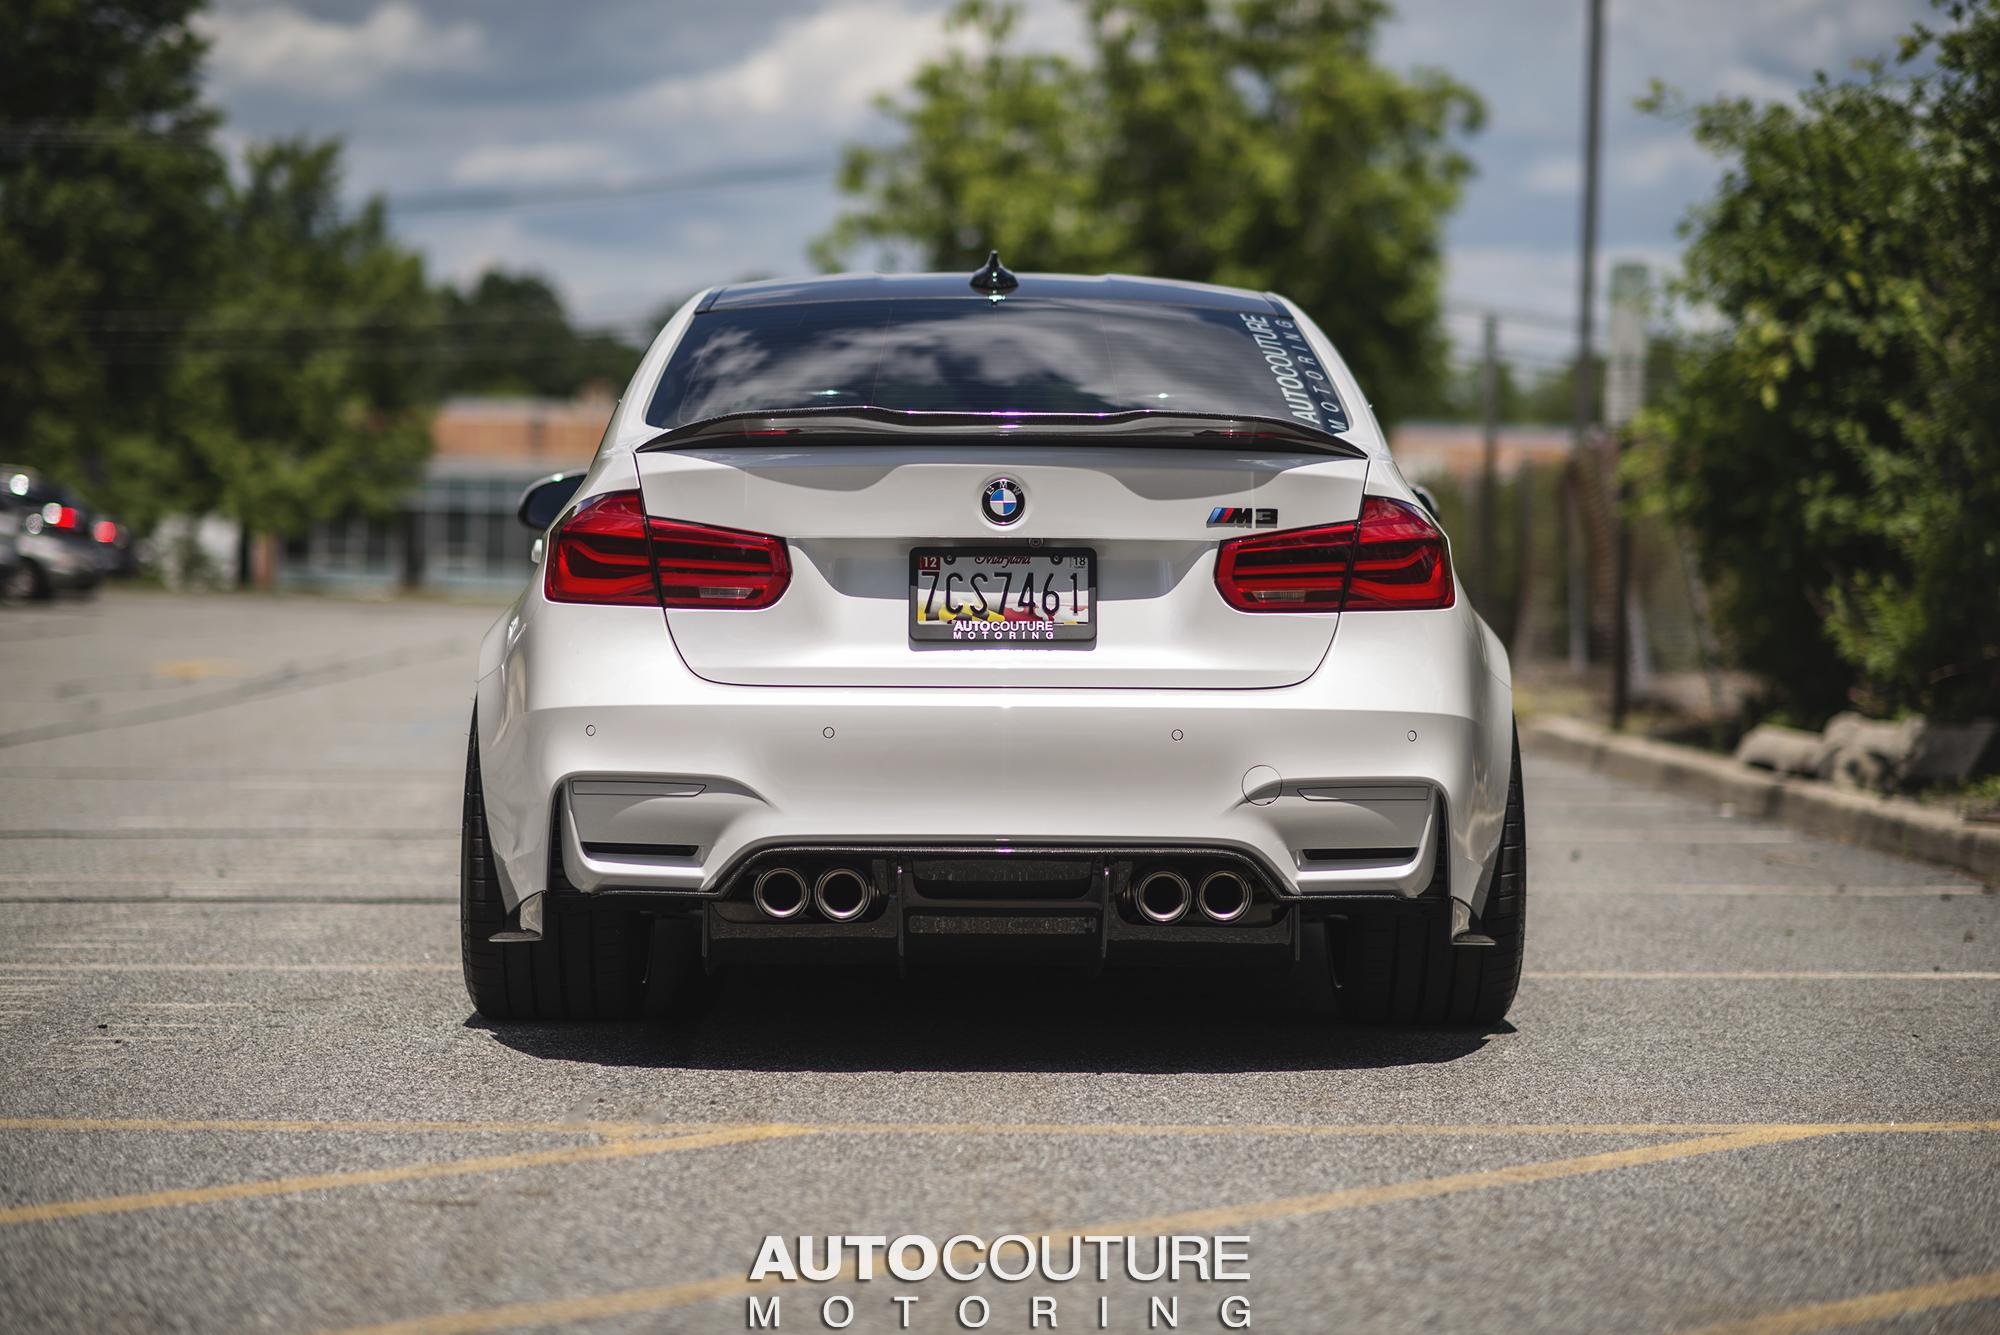 AUTOCouture Motoring BMW M3